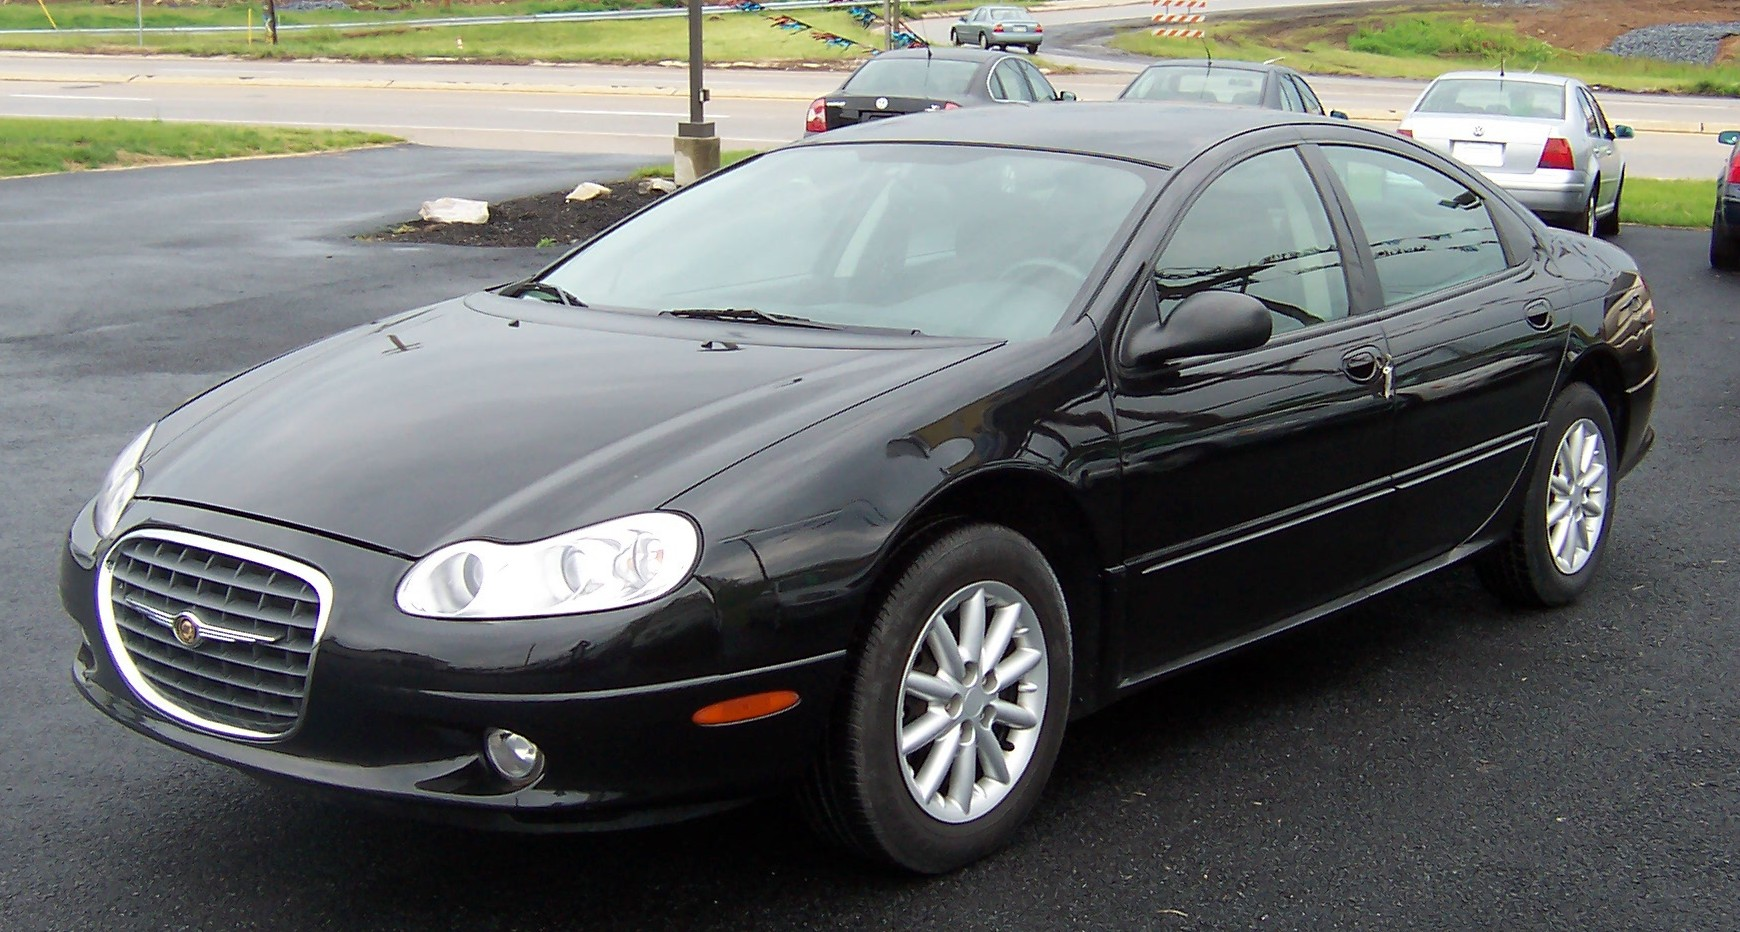 2002 Chrysler LHS BHPH Fair Market Value